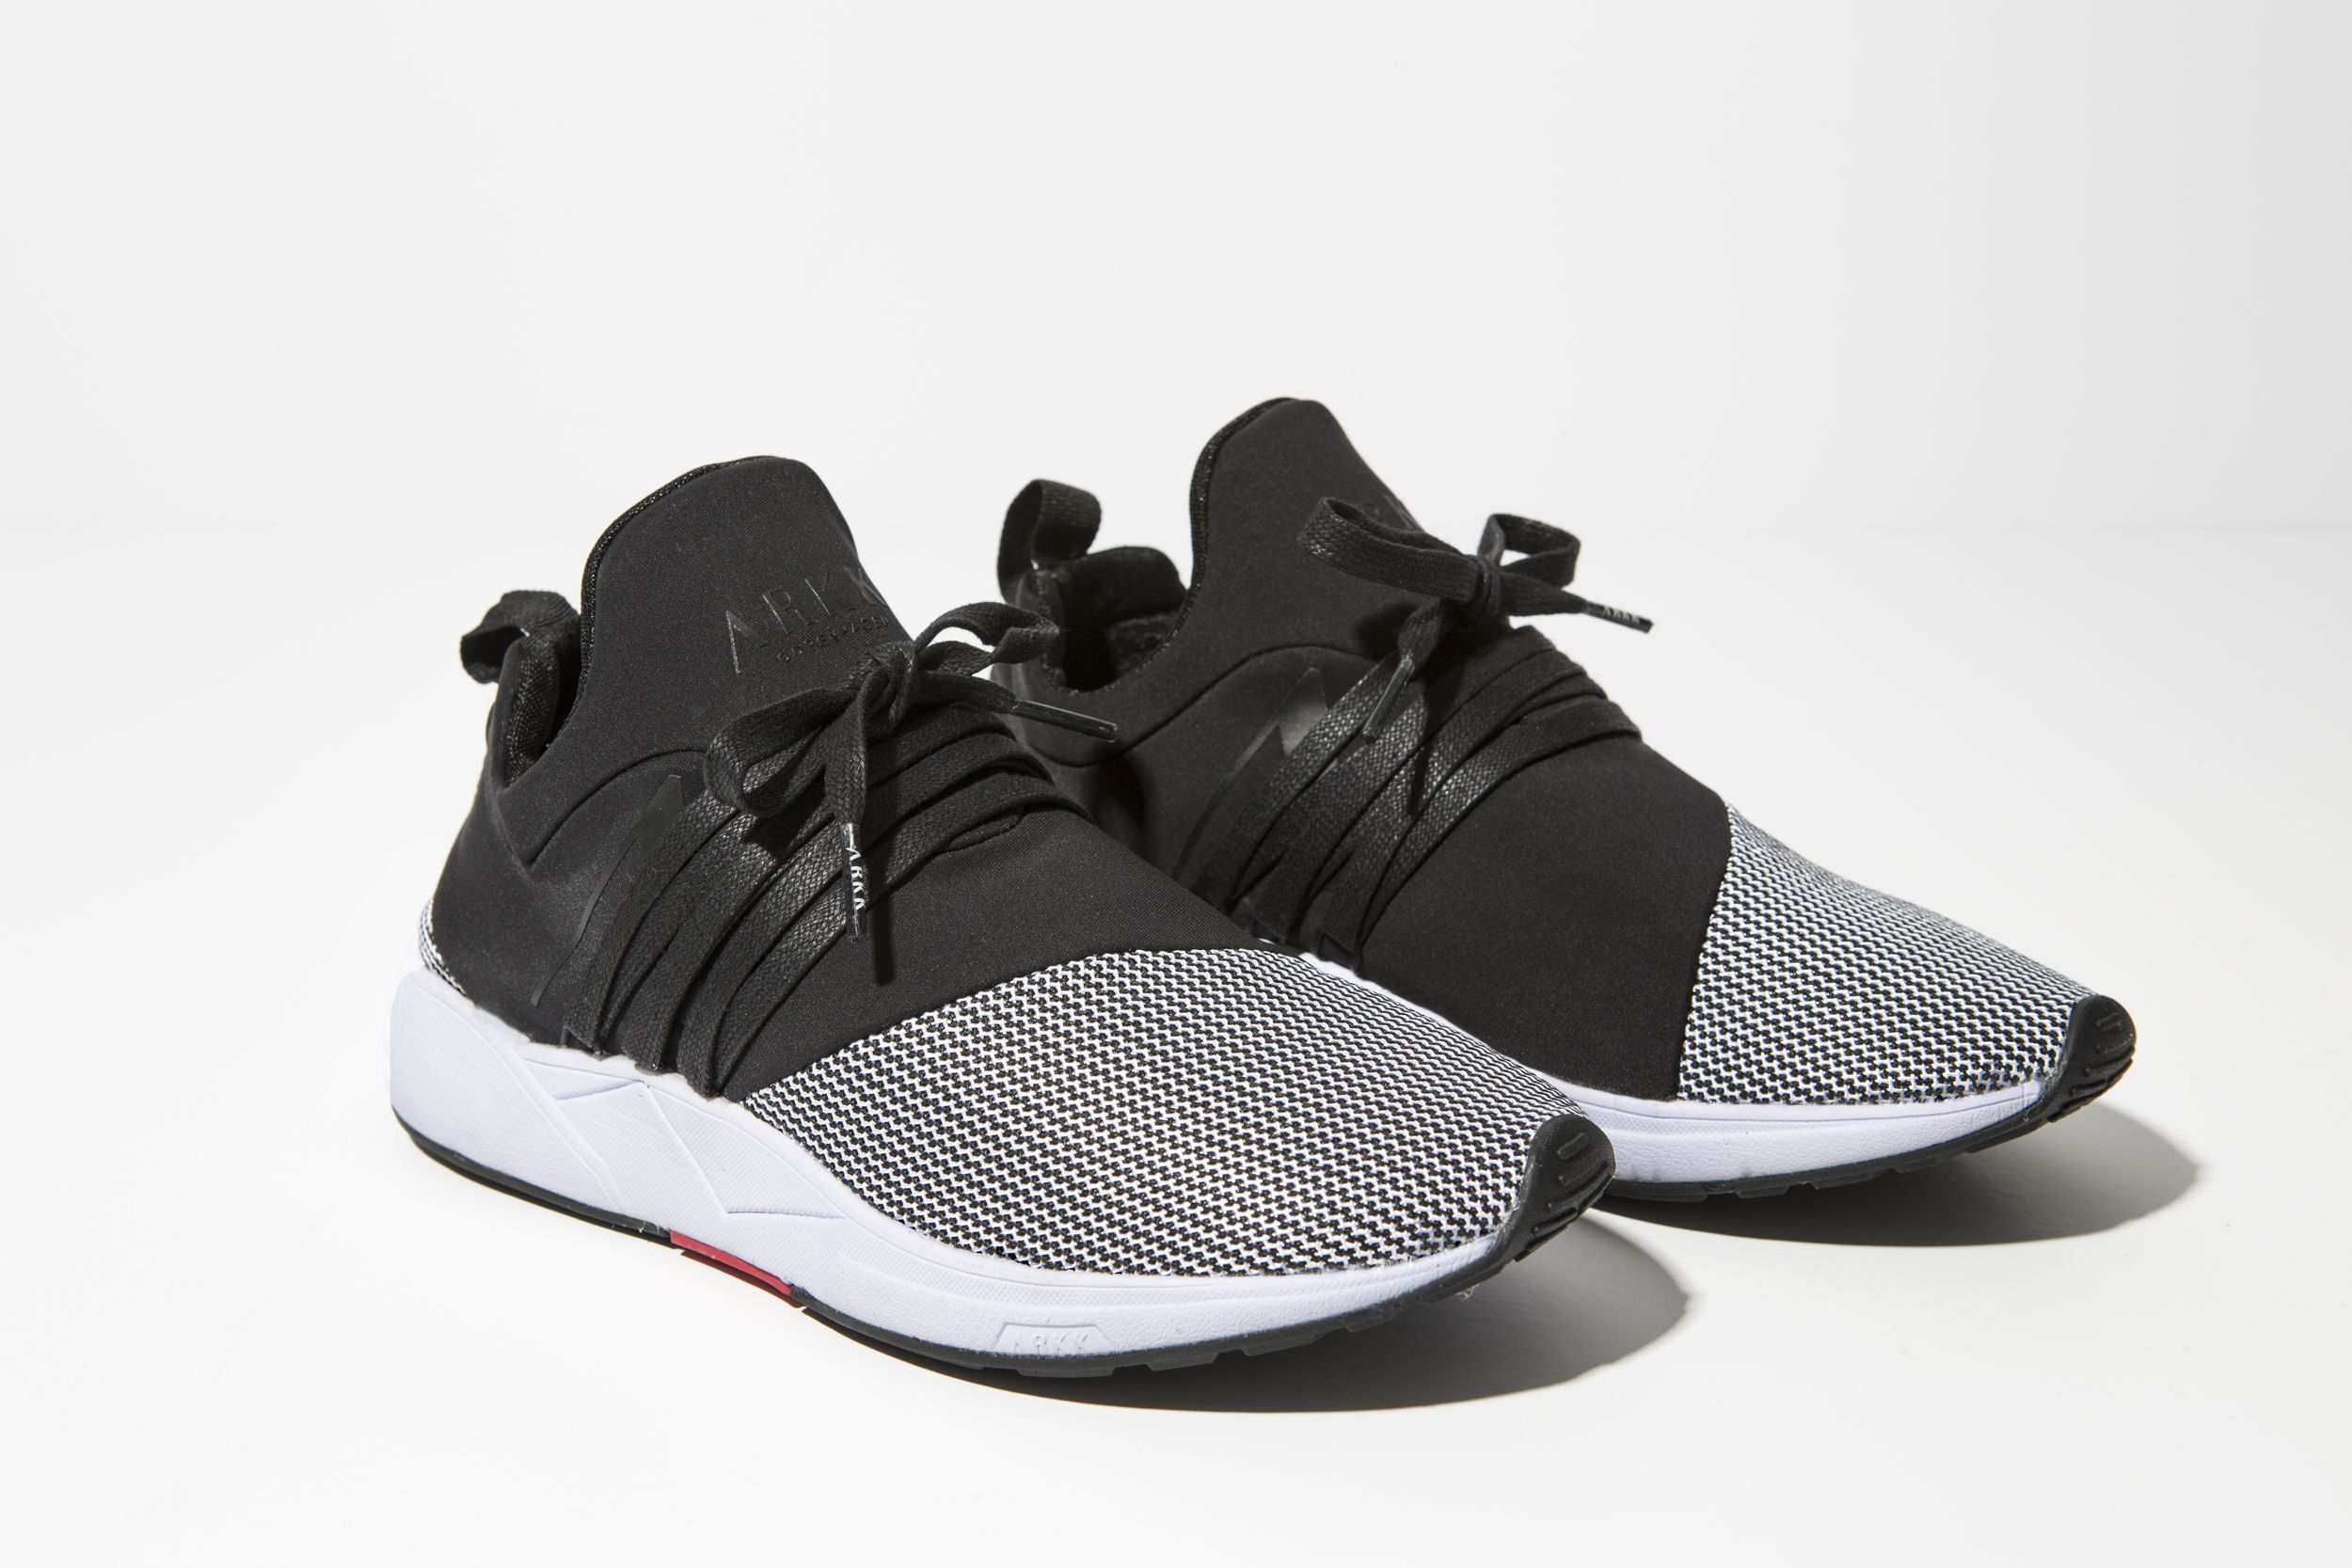 ca23d42d3be9a futuristic sneaker sesation from copenhagen  sneakers  arkkcopenhagen  Unique Shoes